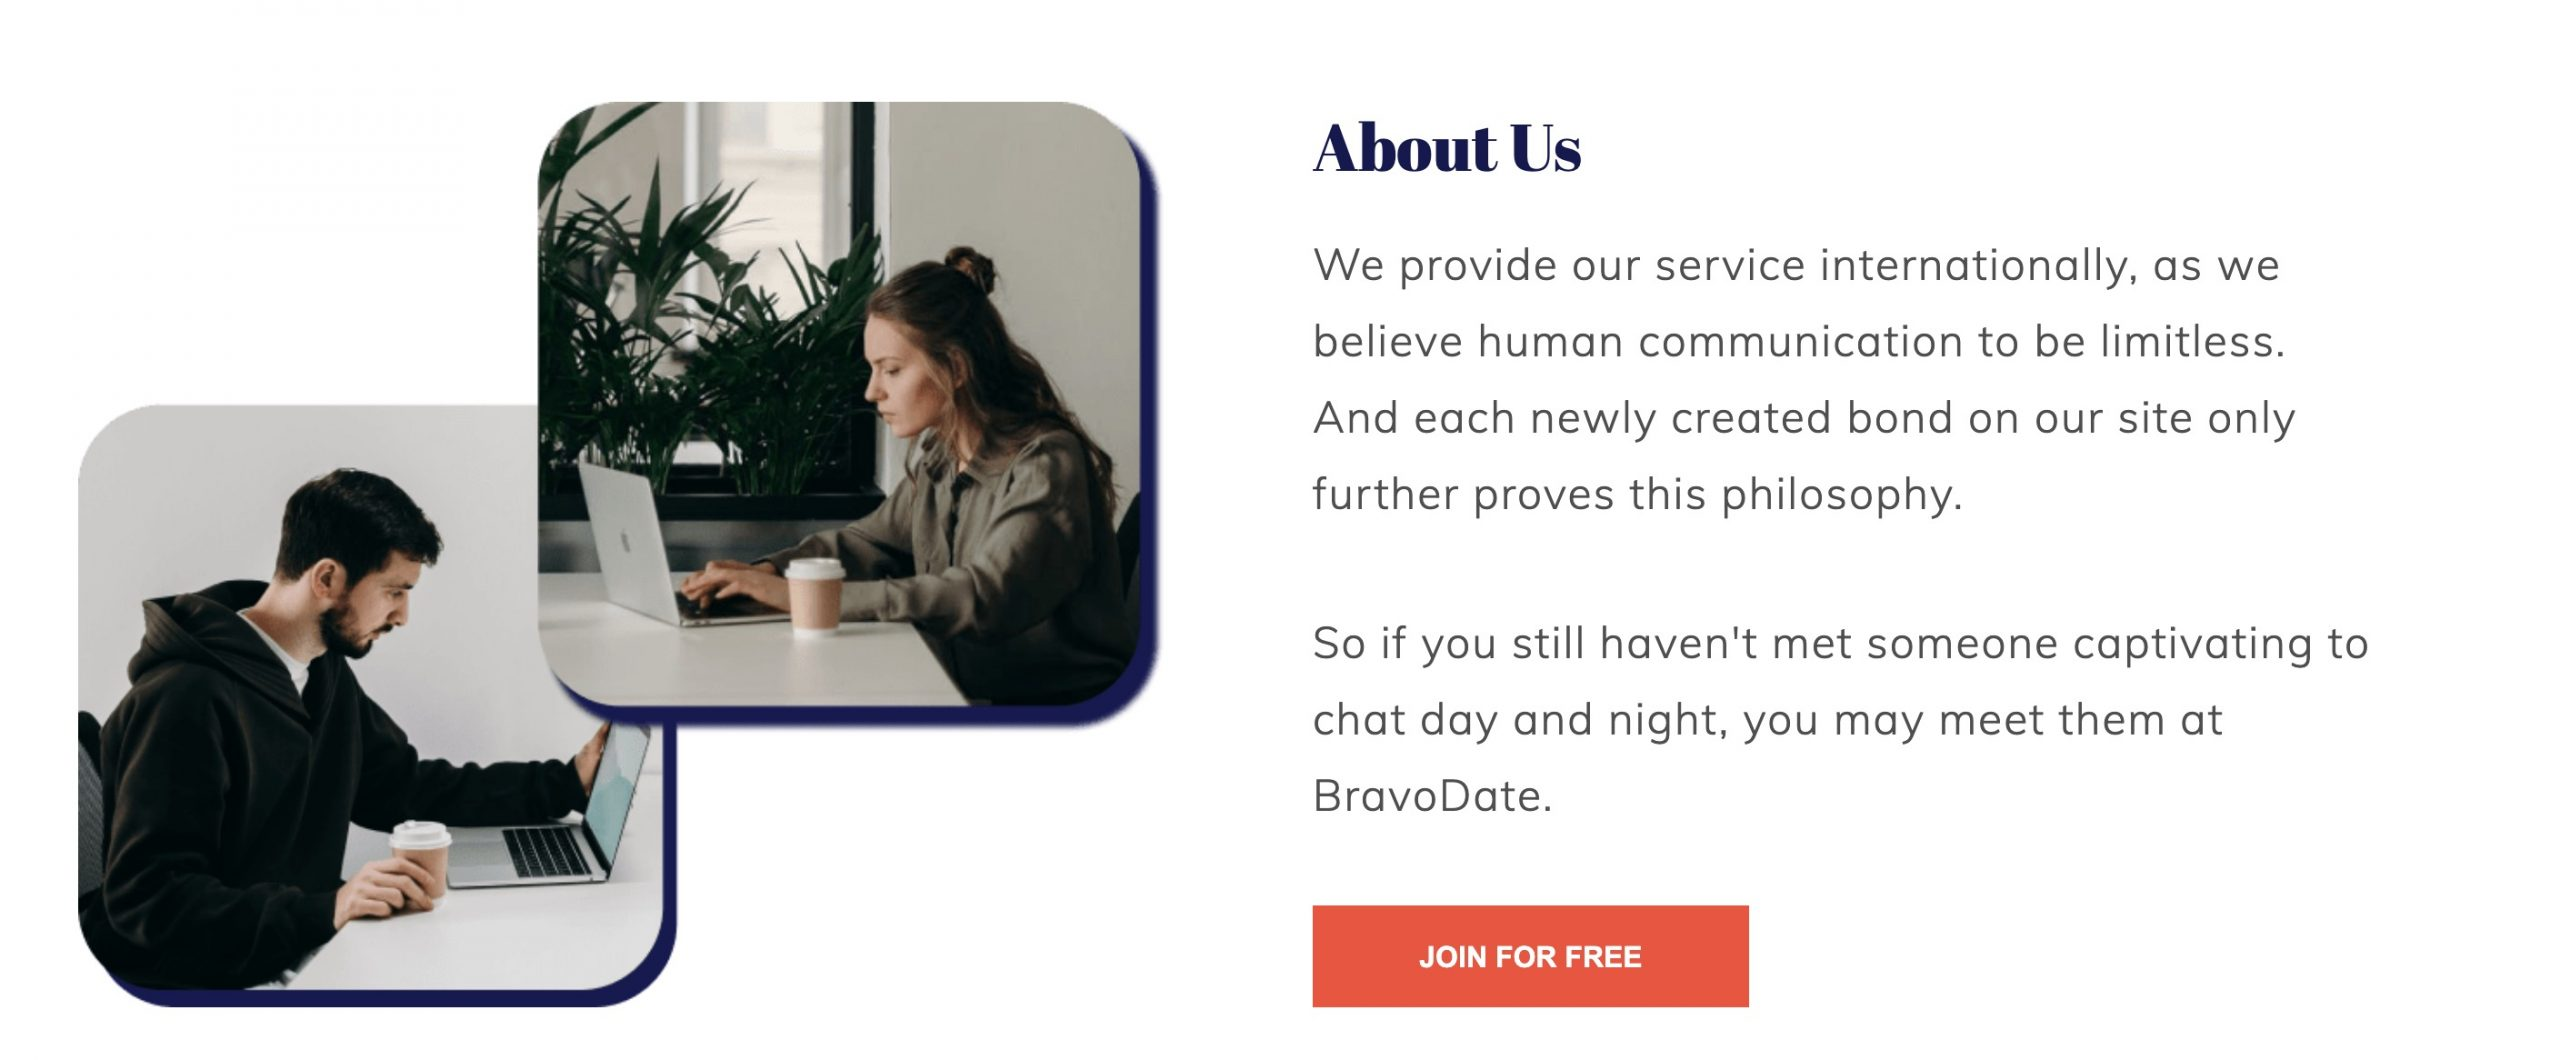 BravoDate about us